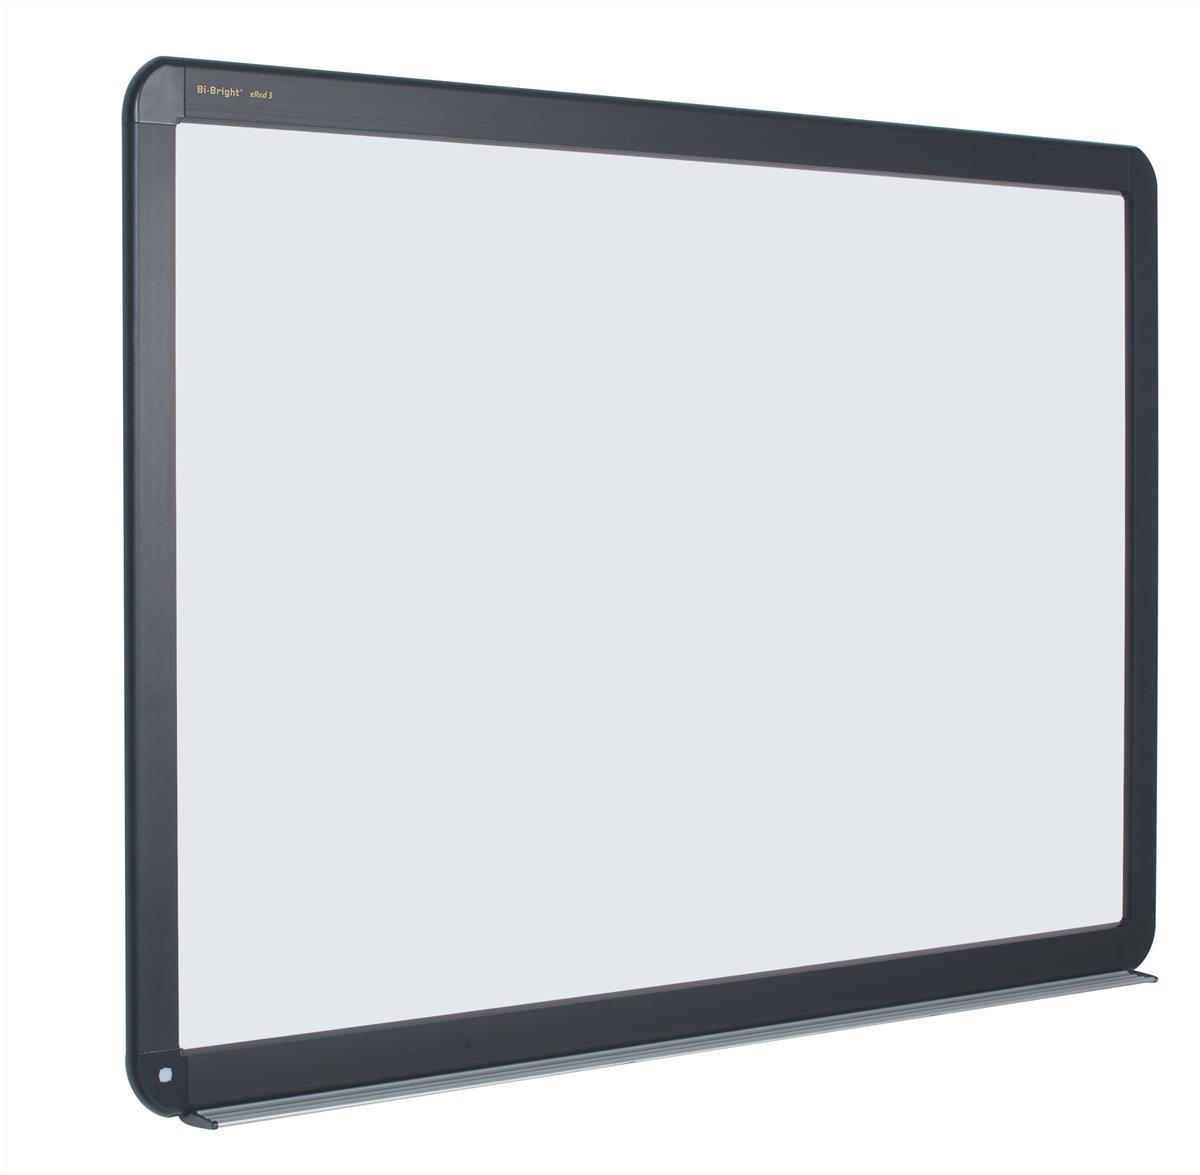 Bi-Bright Interactive Drywipe Whiteboard 78in W1779xD32xH1326mm Ref BI1291800